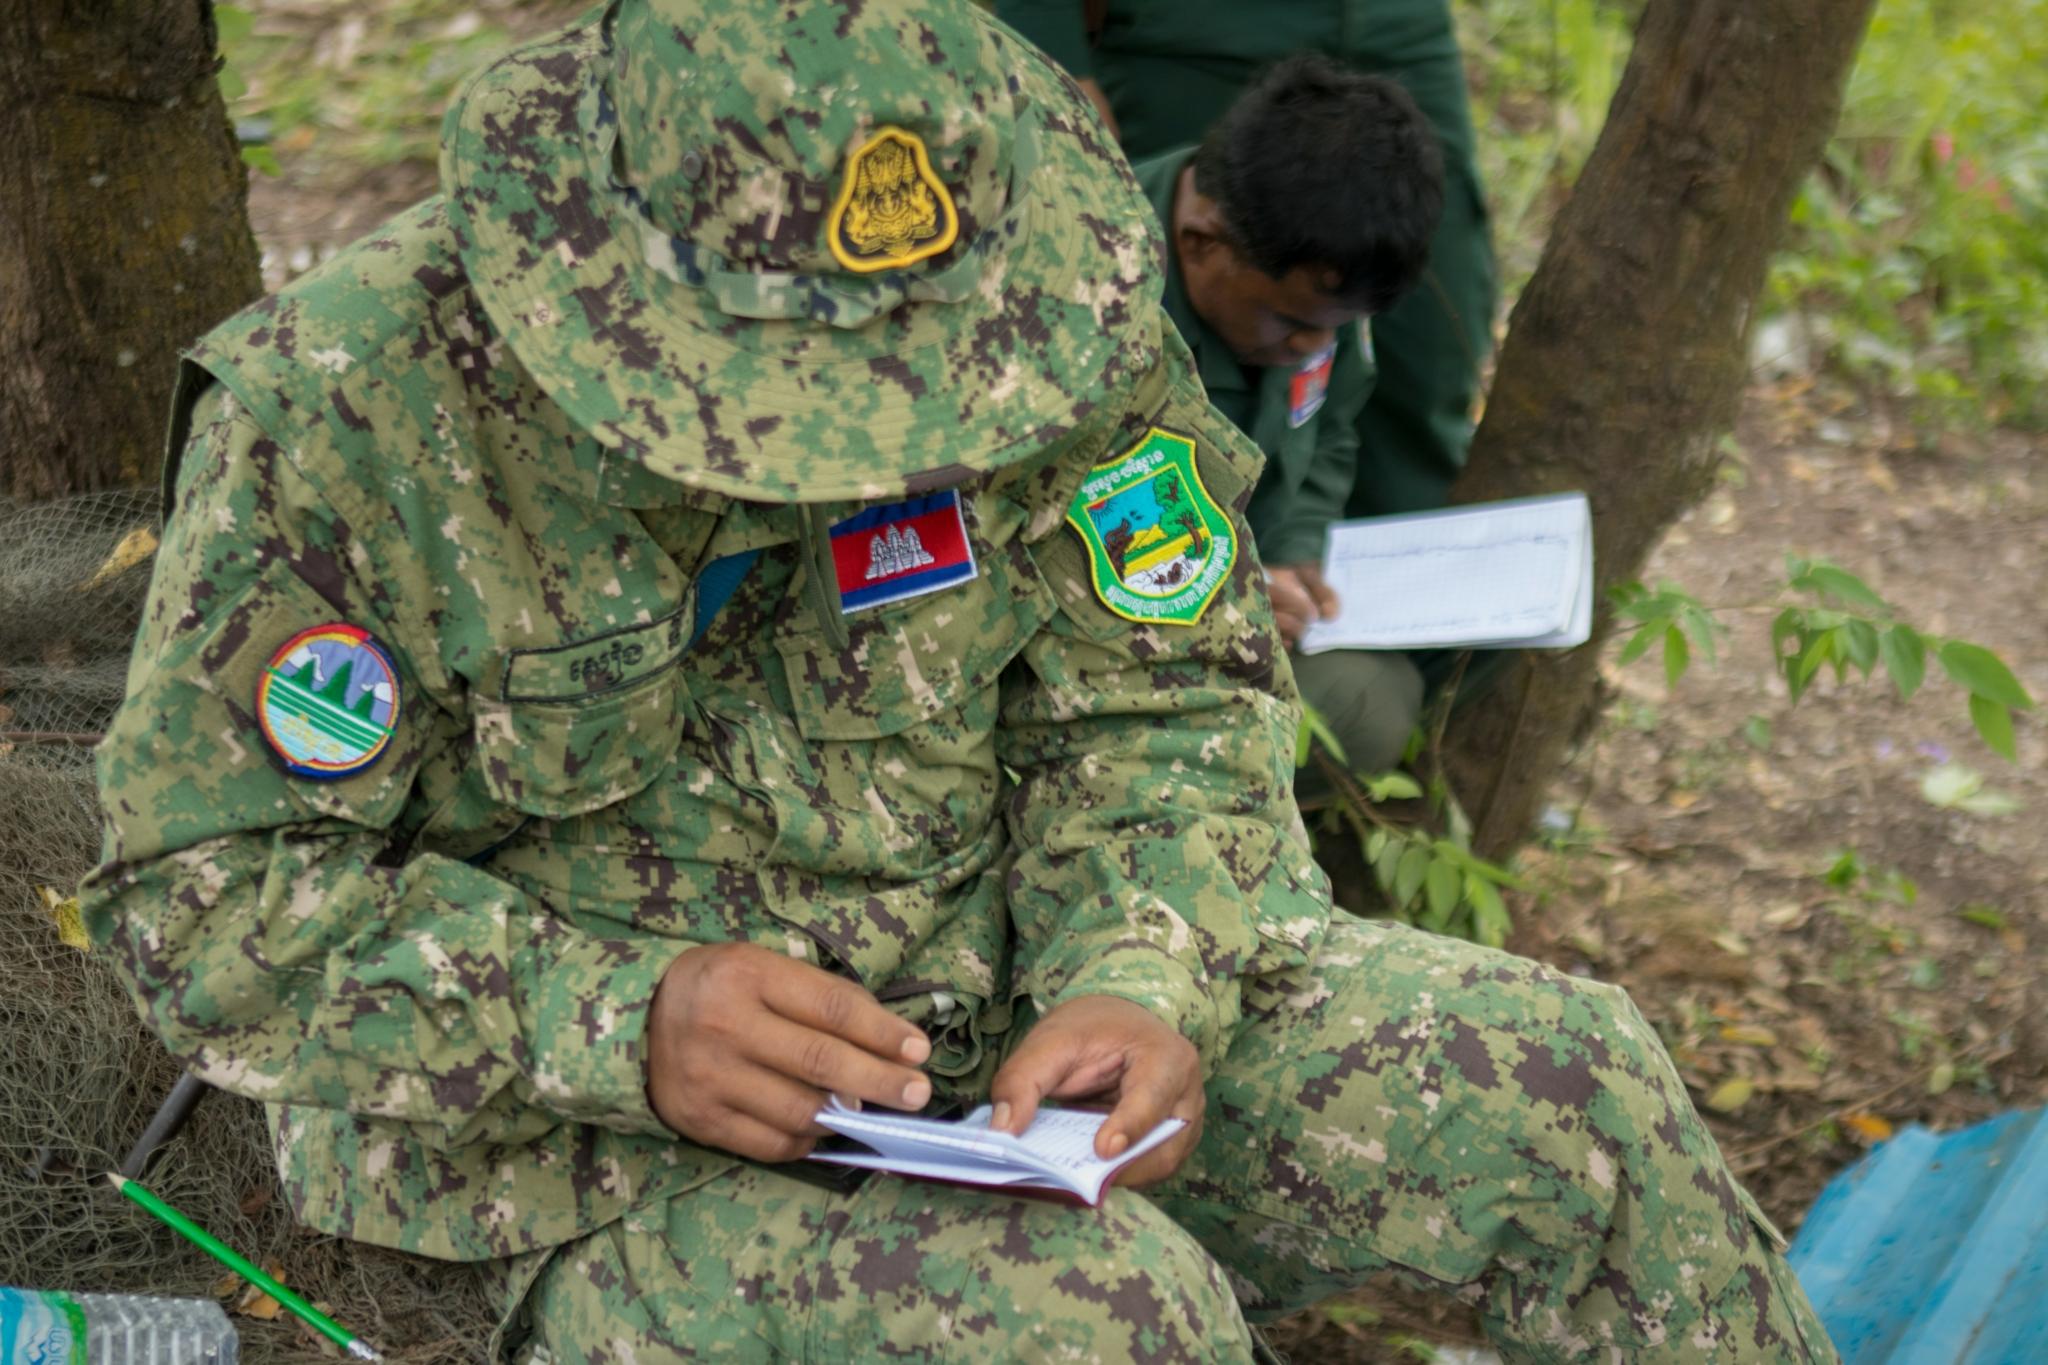 Wildlife Alliance rangers in Cambodia